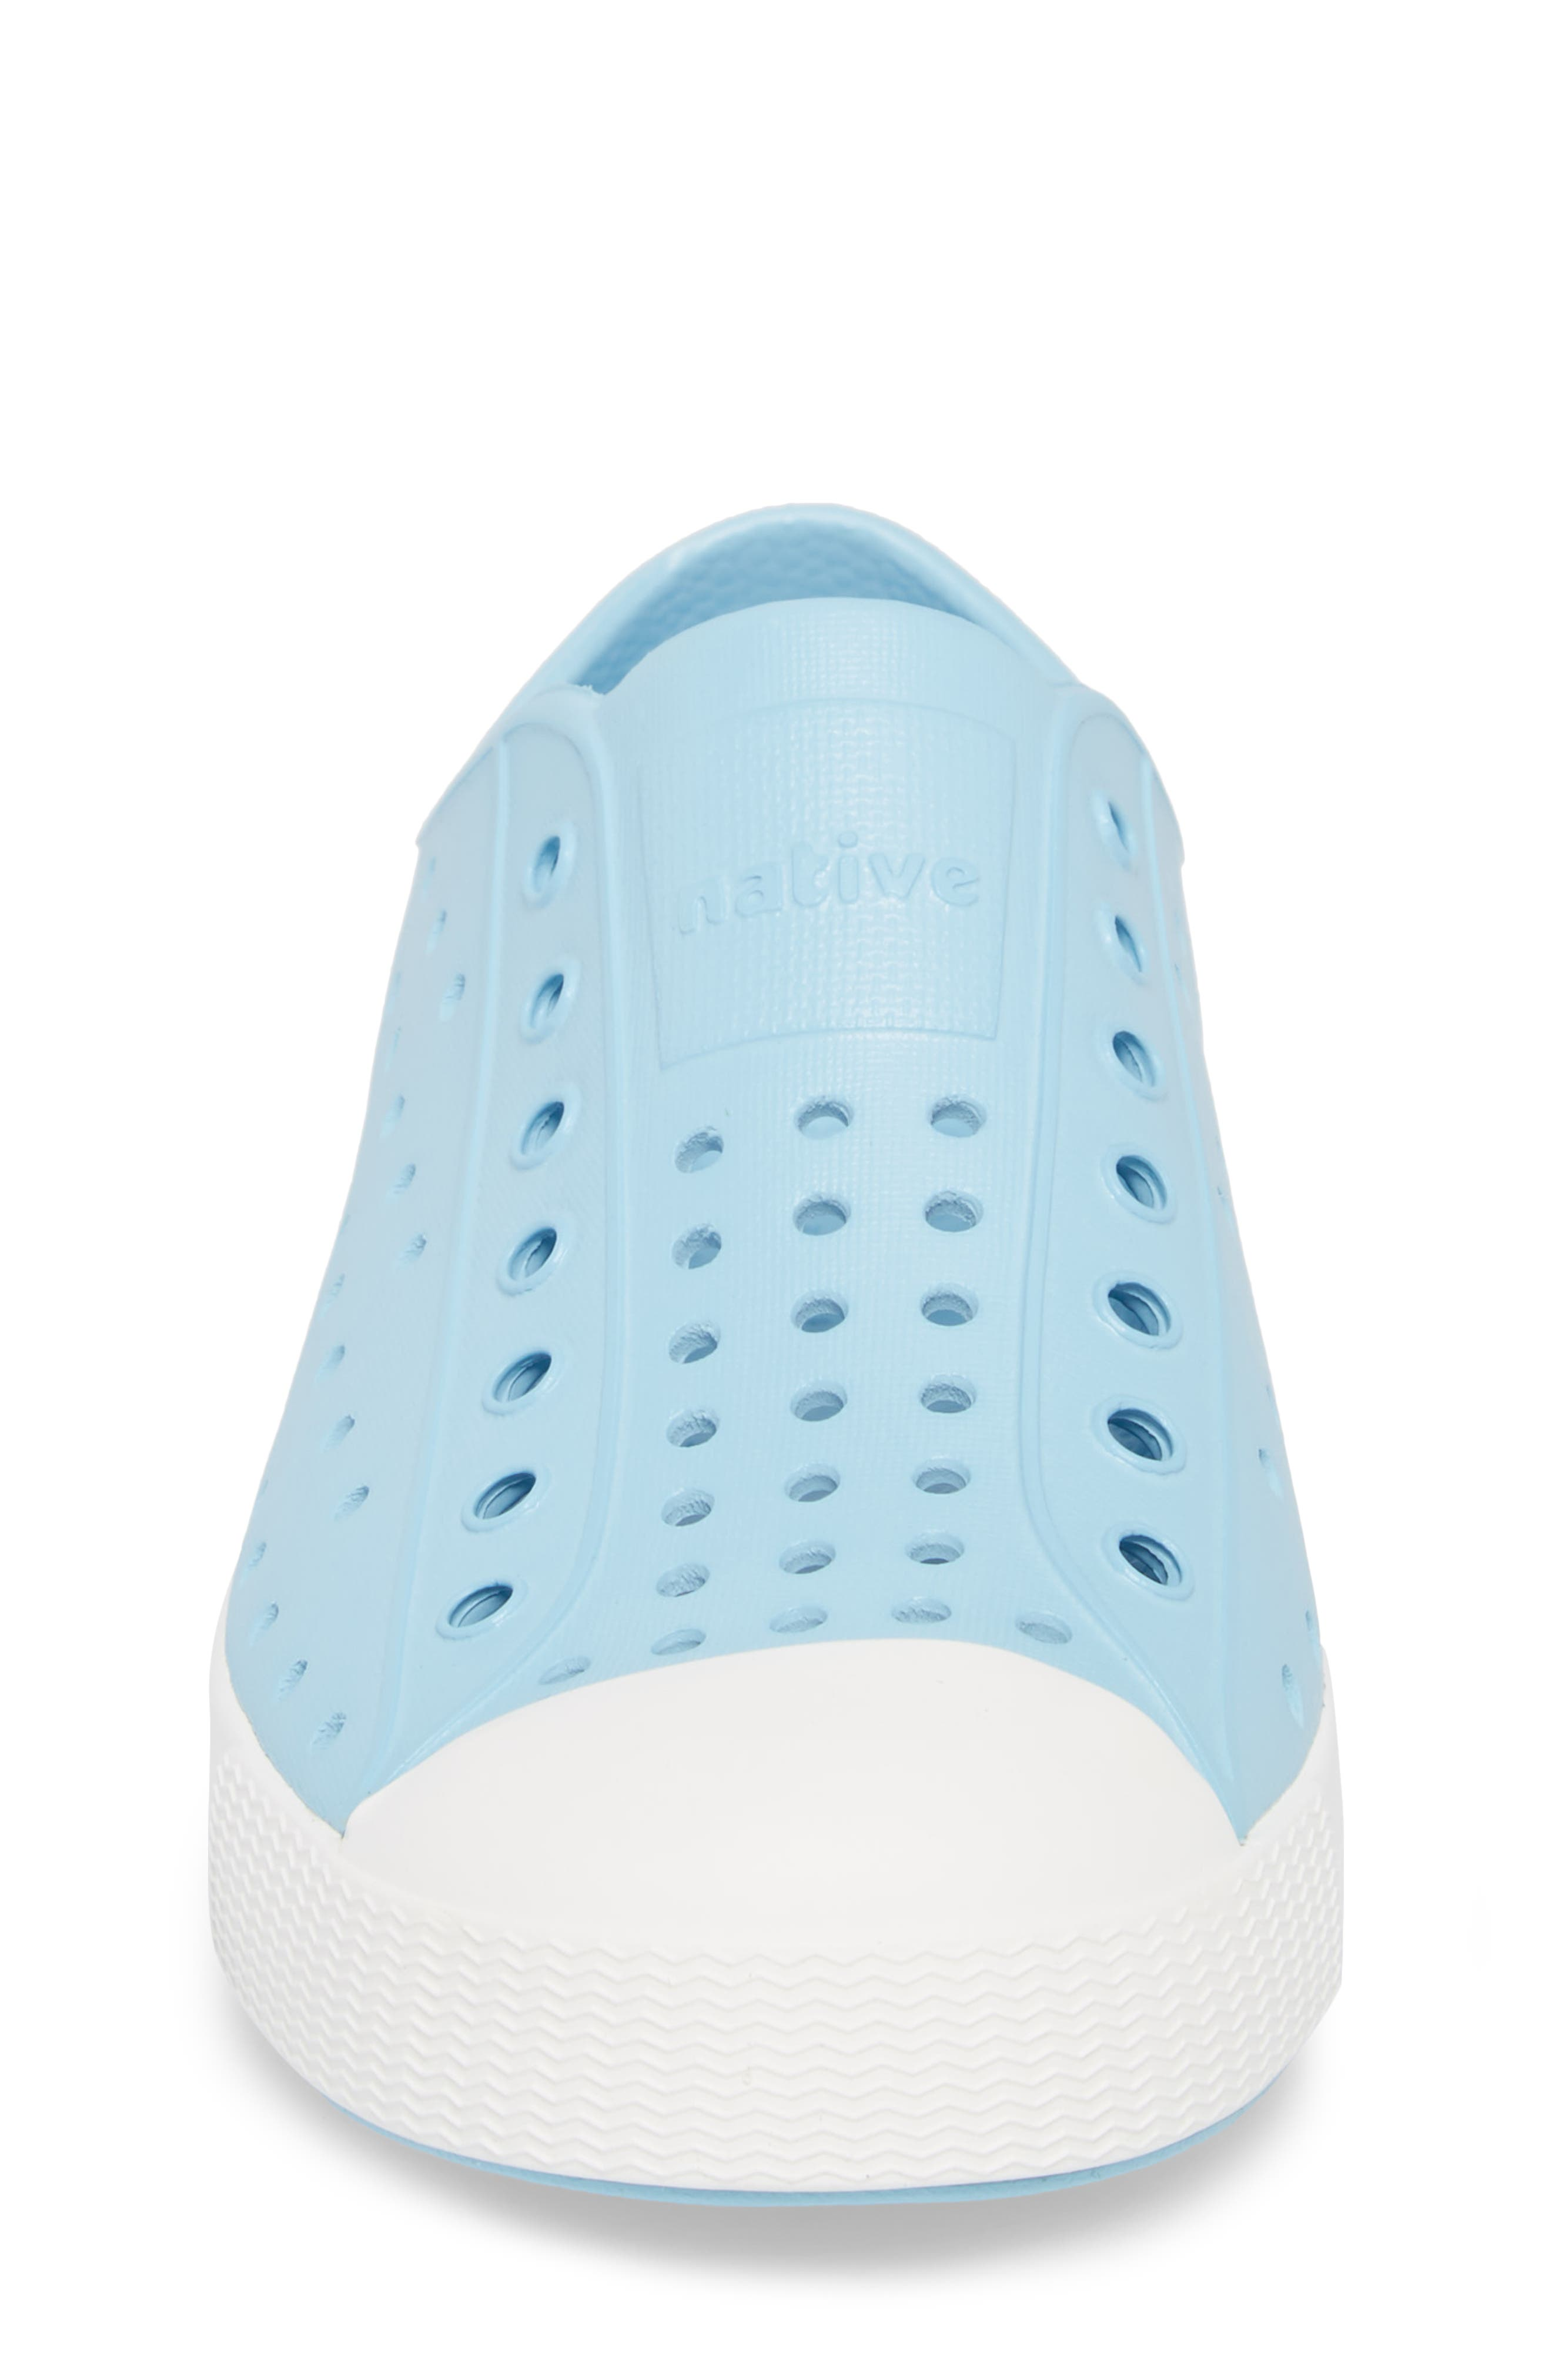 'Jefferson' Water Friendly Slip-On Sneaker,                             Alternate thumbnail 180, color,